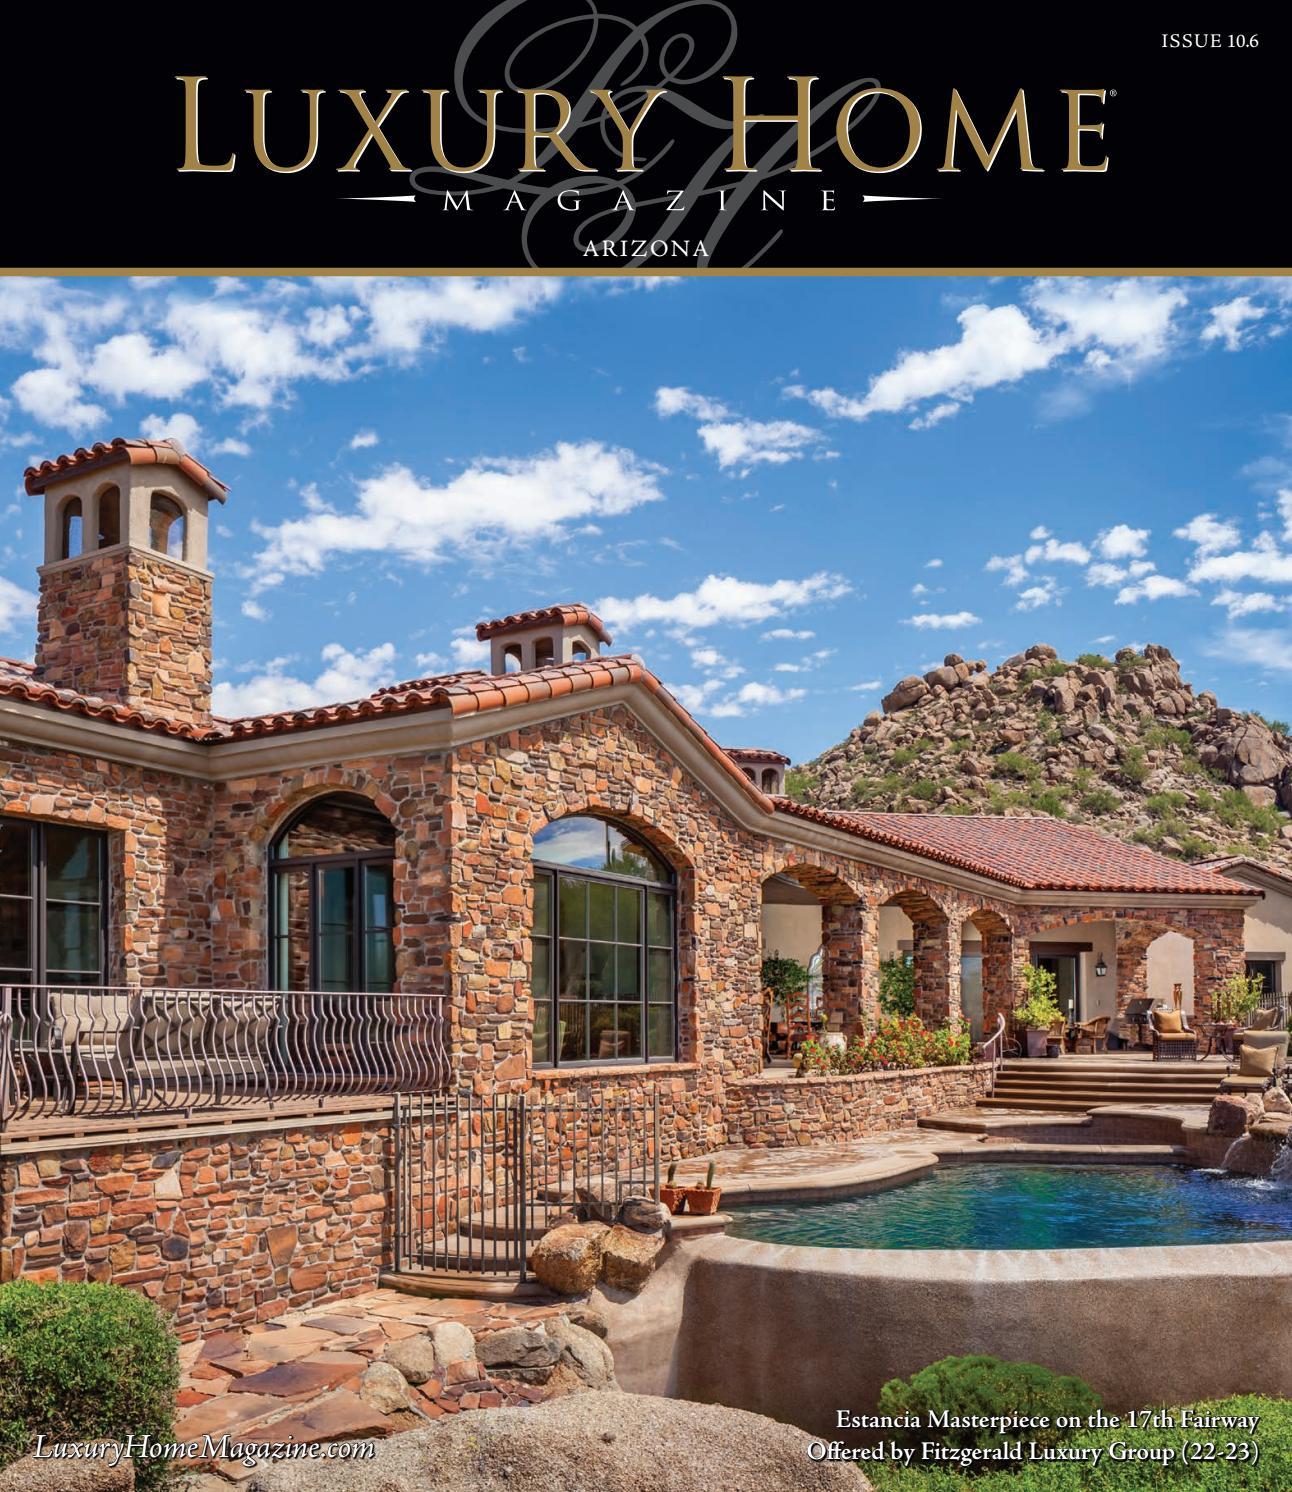 luxury home magazine arizona issue 6 5 by luxury home magazine issuu. Black Bedroom Furniture Sets. Home Design Ideas